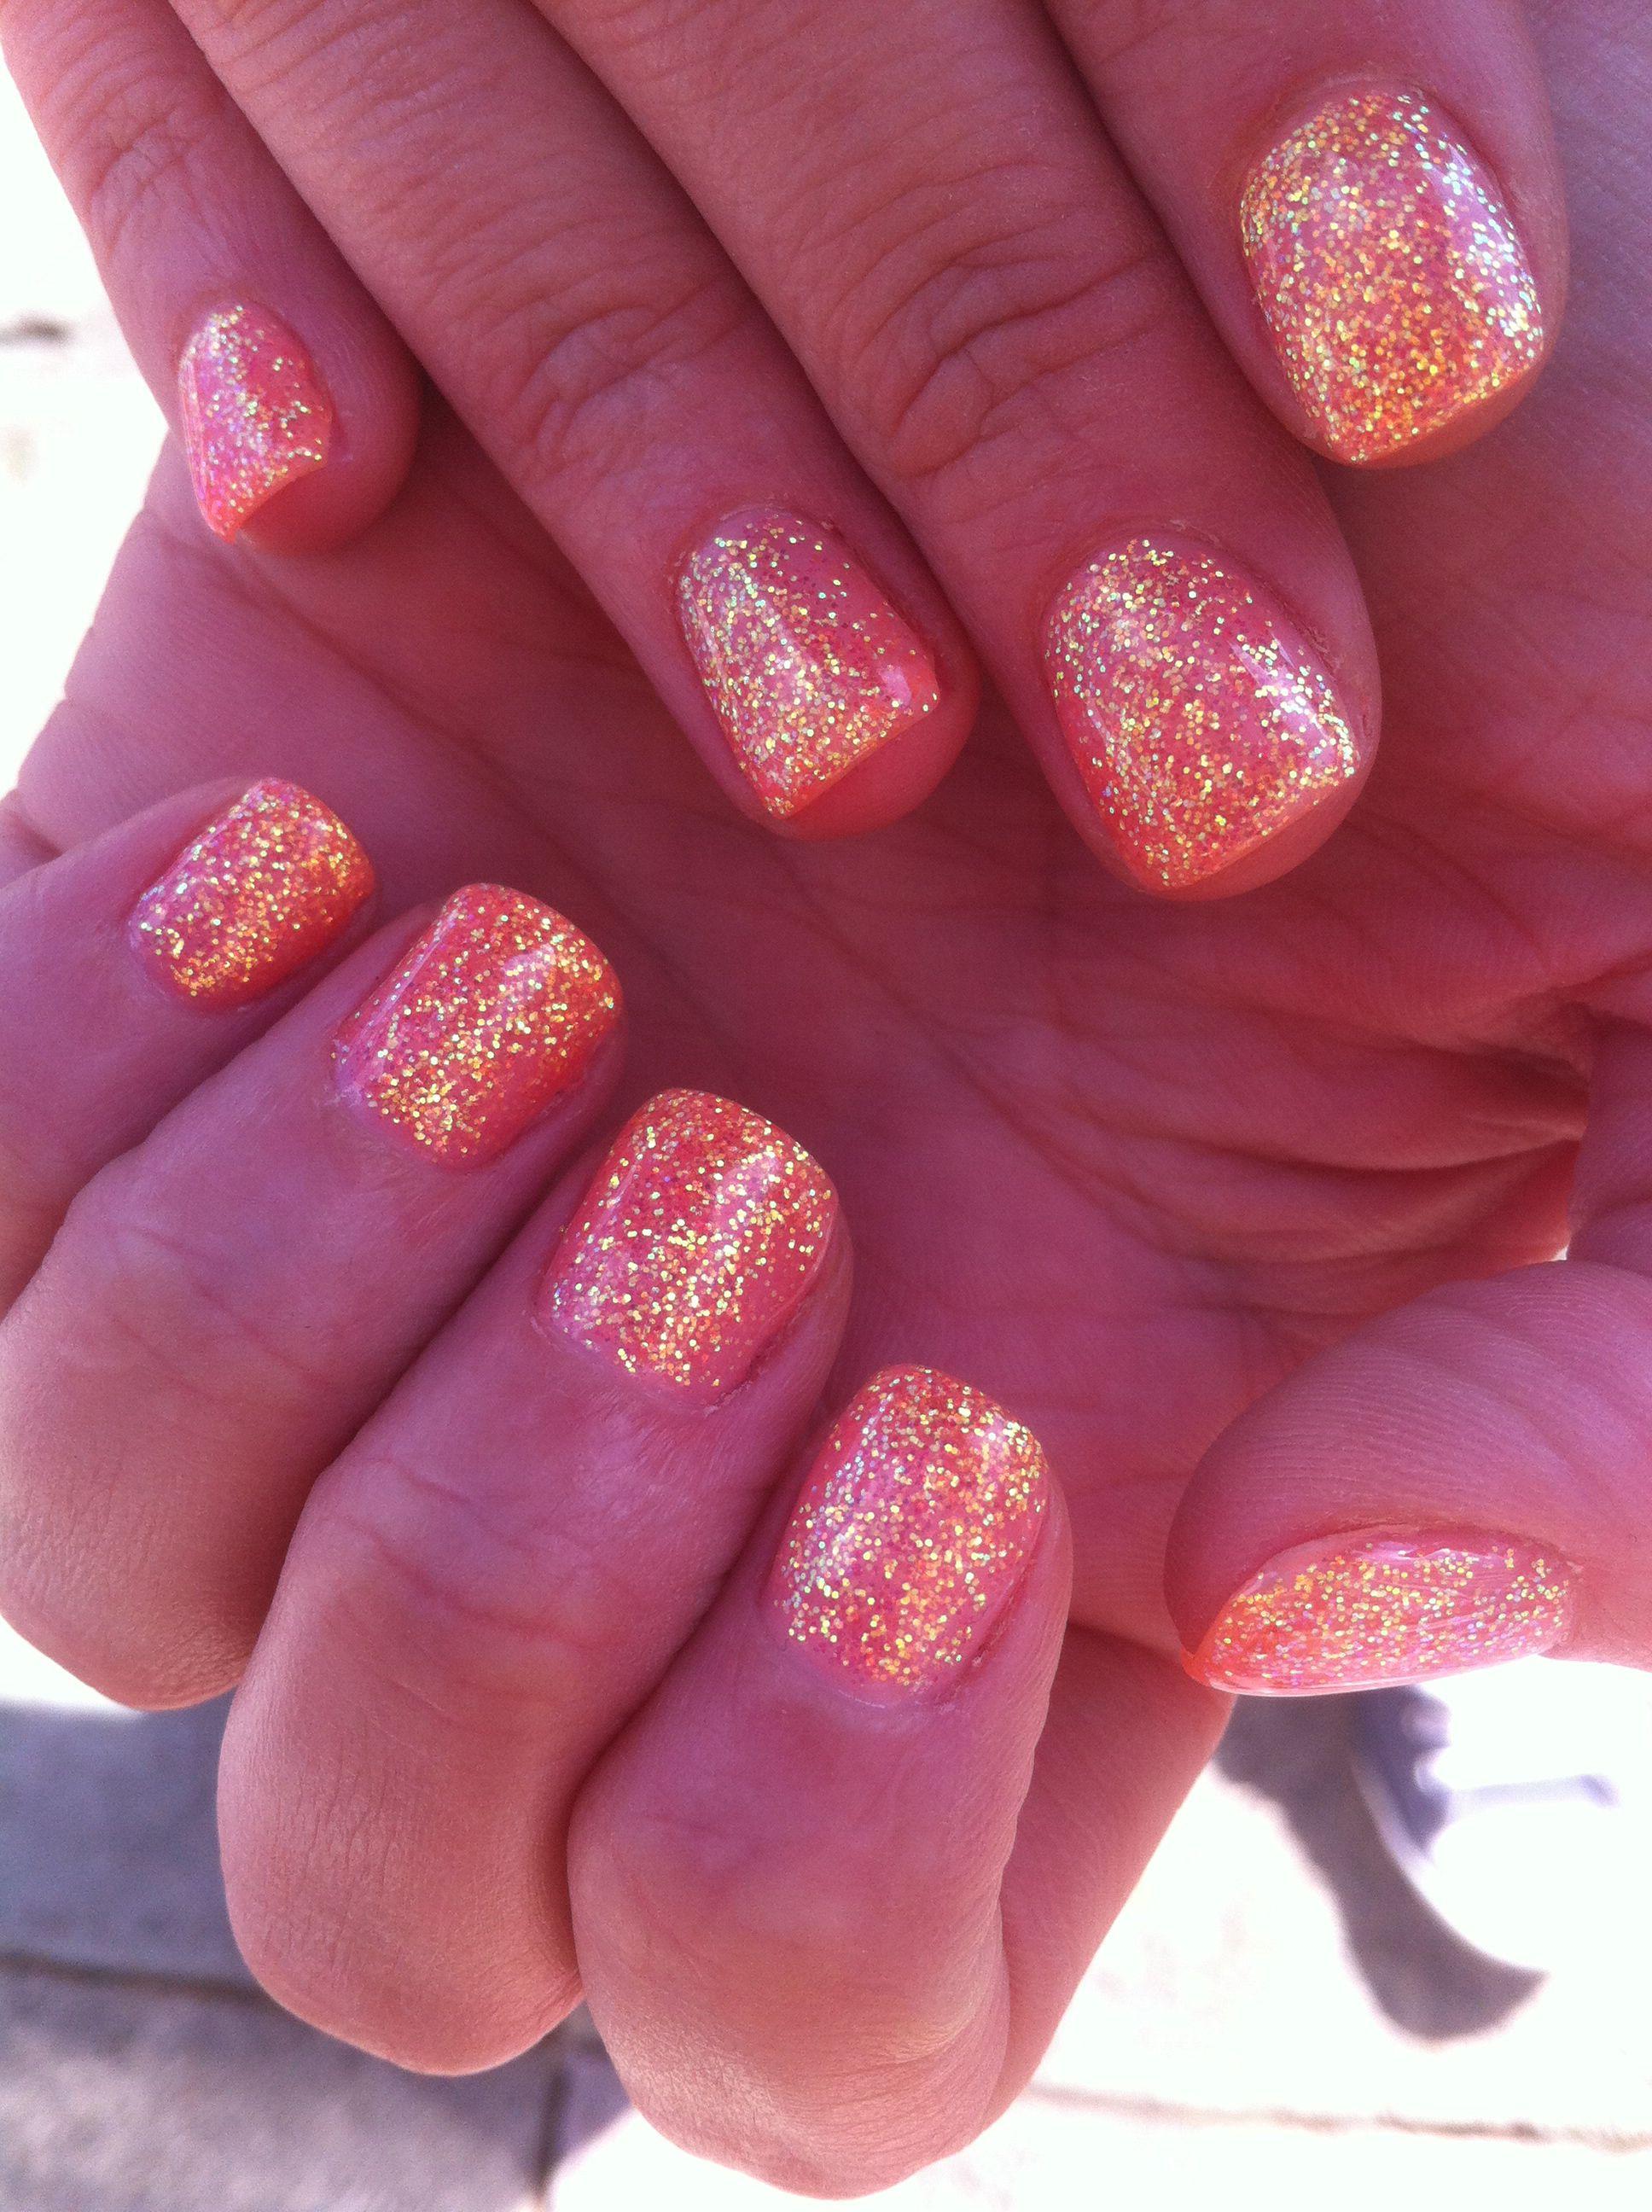 Coral Glitter Calgel Nails